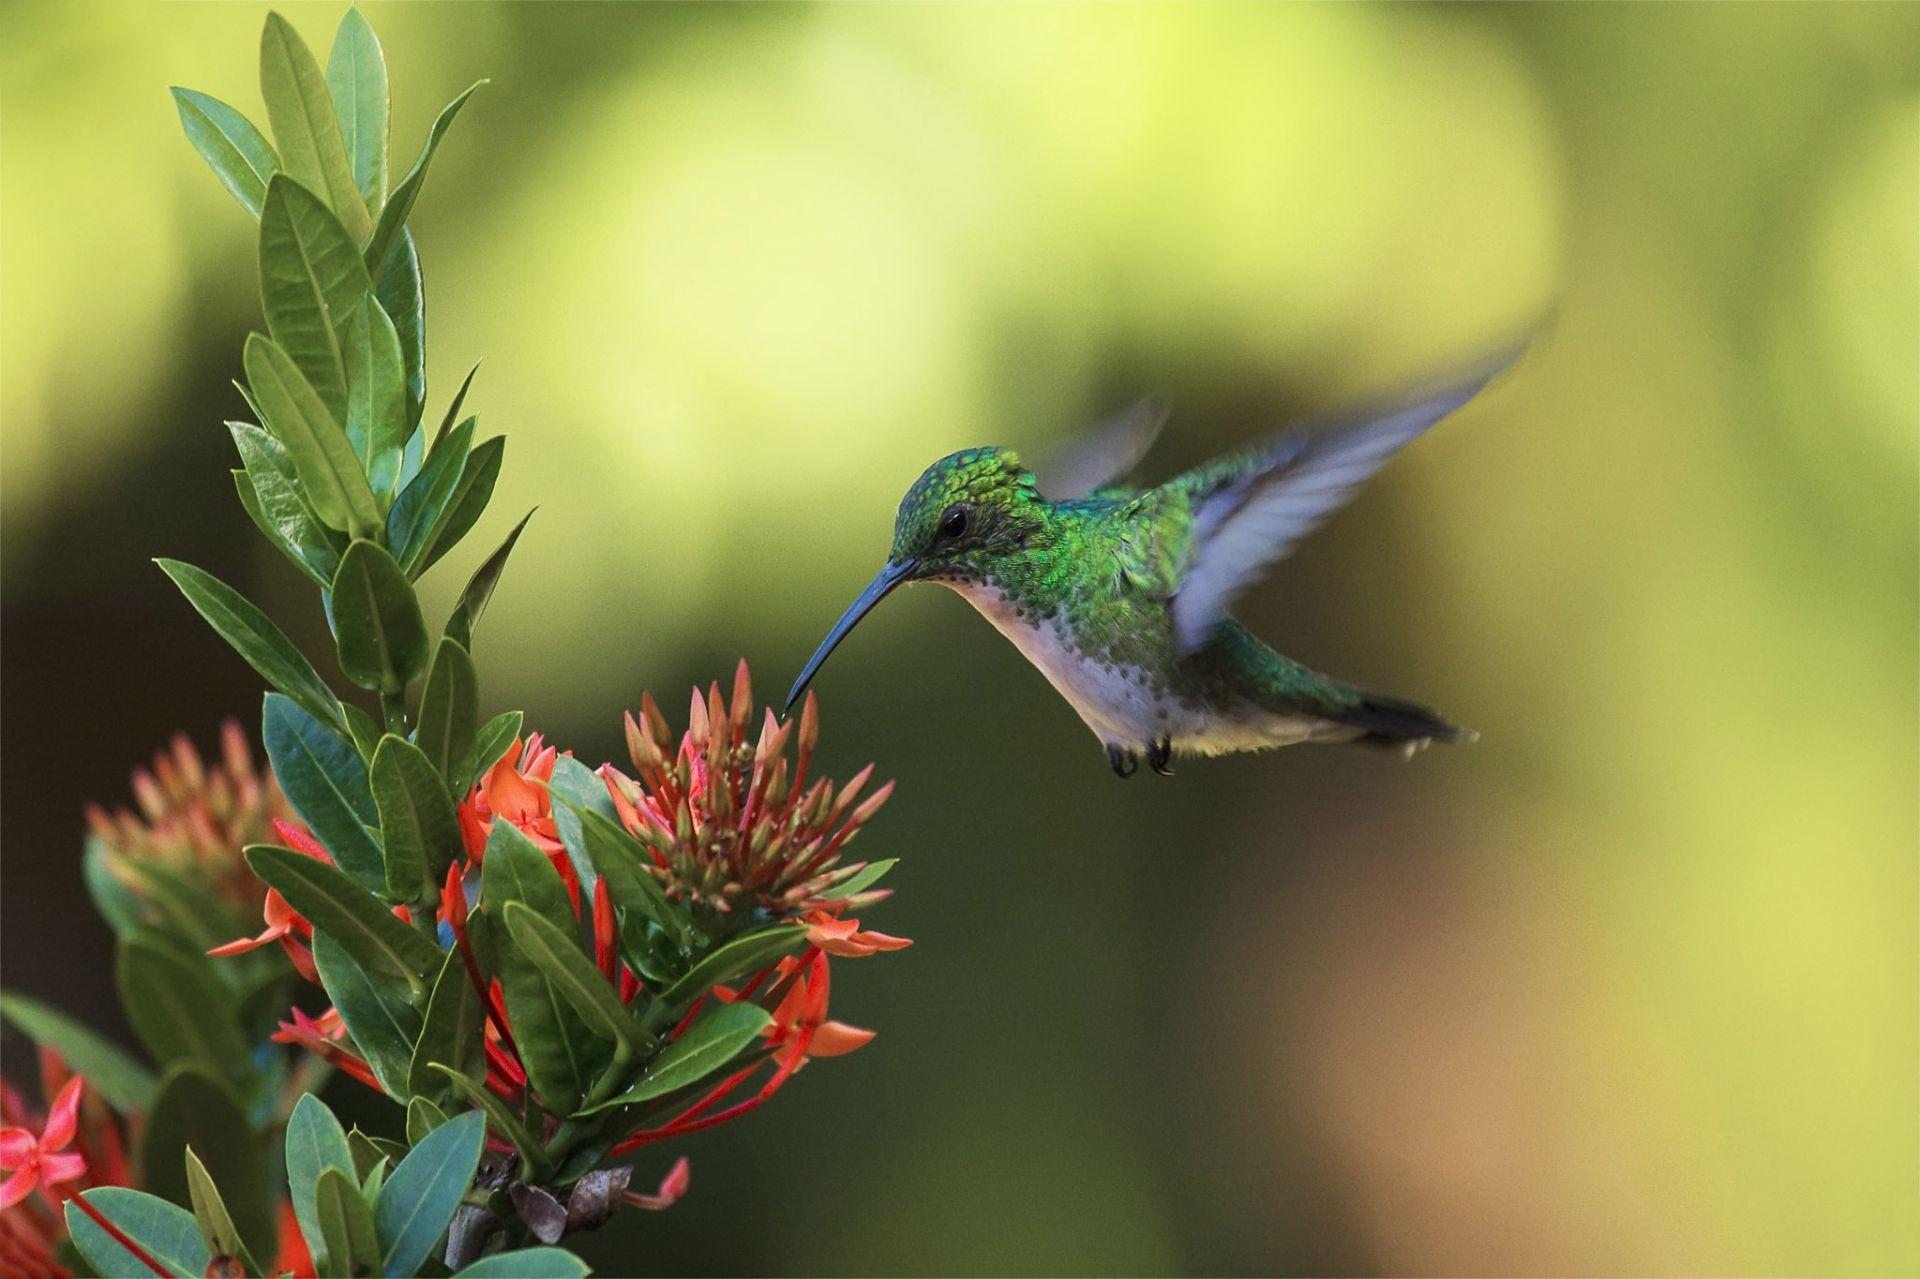 птица цветок  № 2034059 загрузить